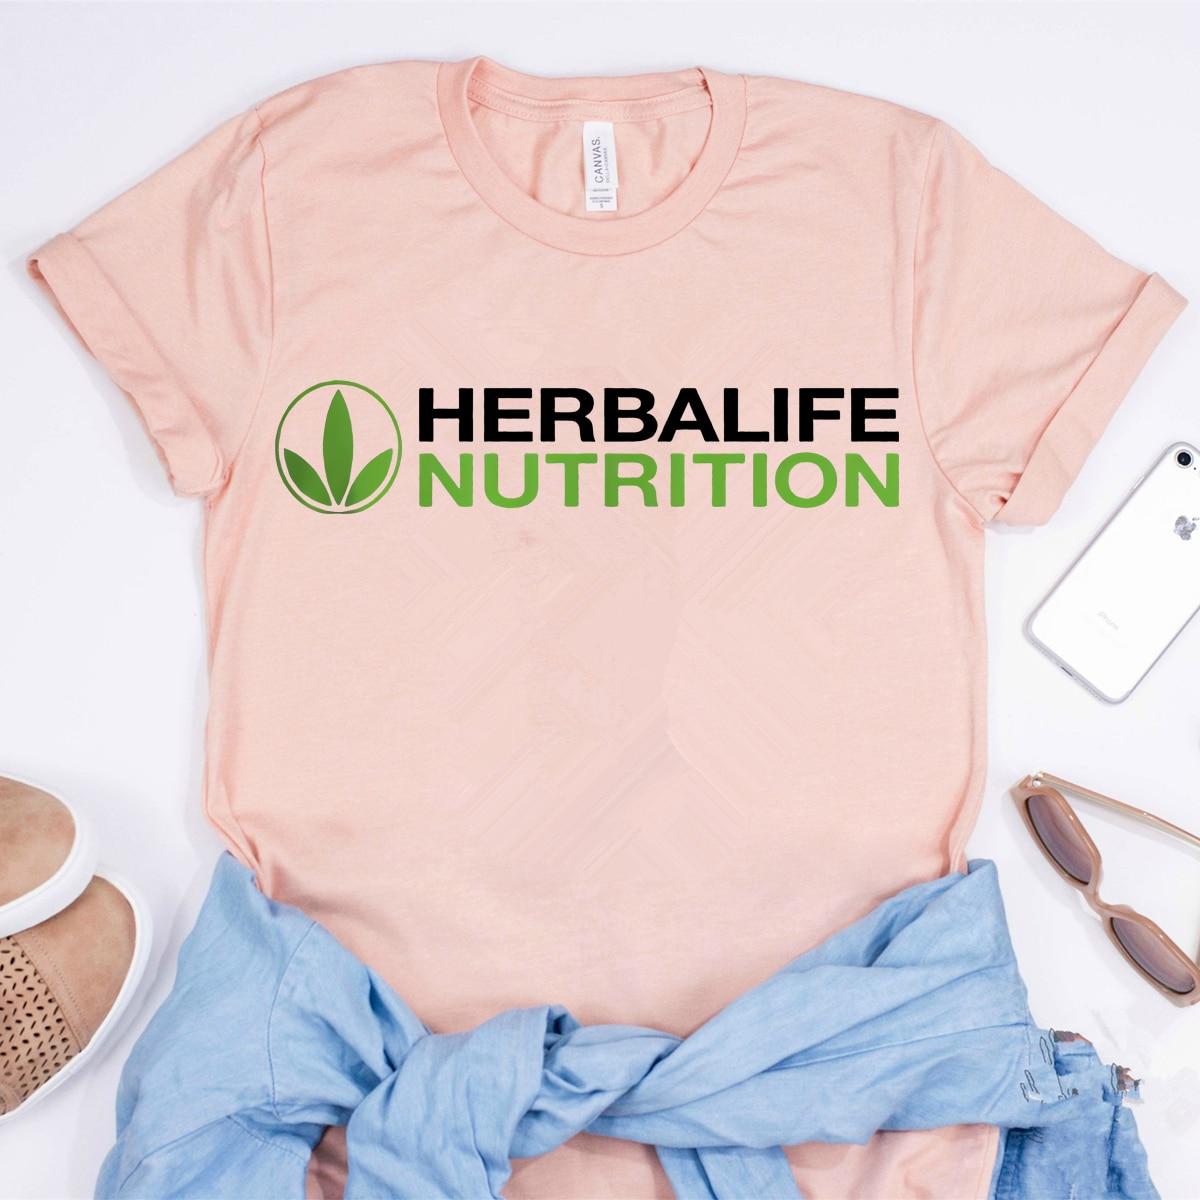 2021 frauen Casual T-shirt Herbalife Ernährung Hemd Nette Herbalife Shirts Ulzzang Tees Harajuku Frauen Tops mädchen T-shirt